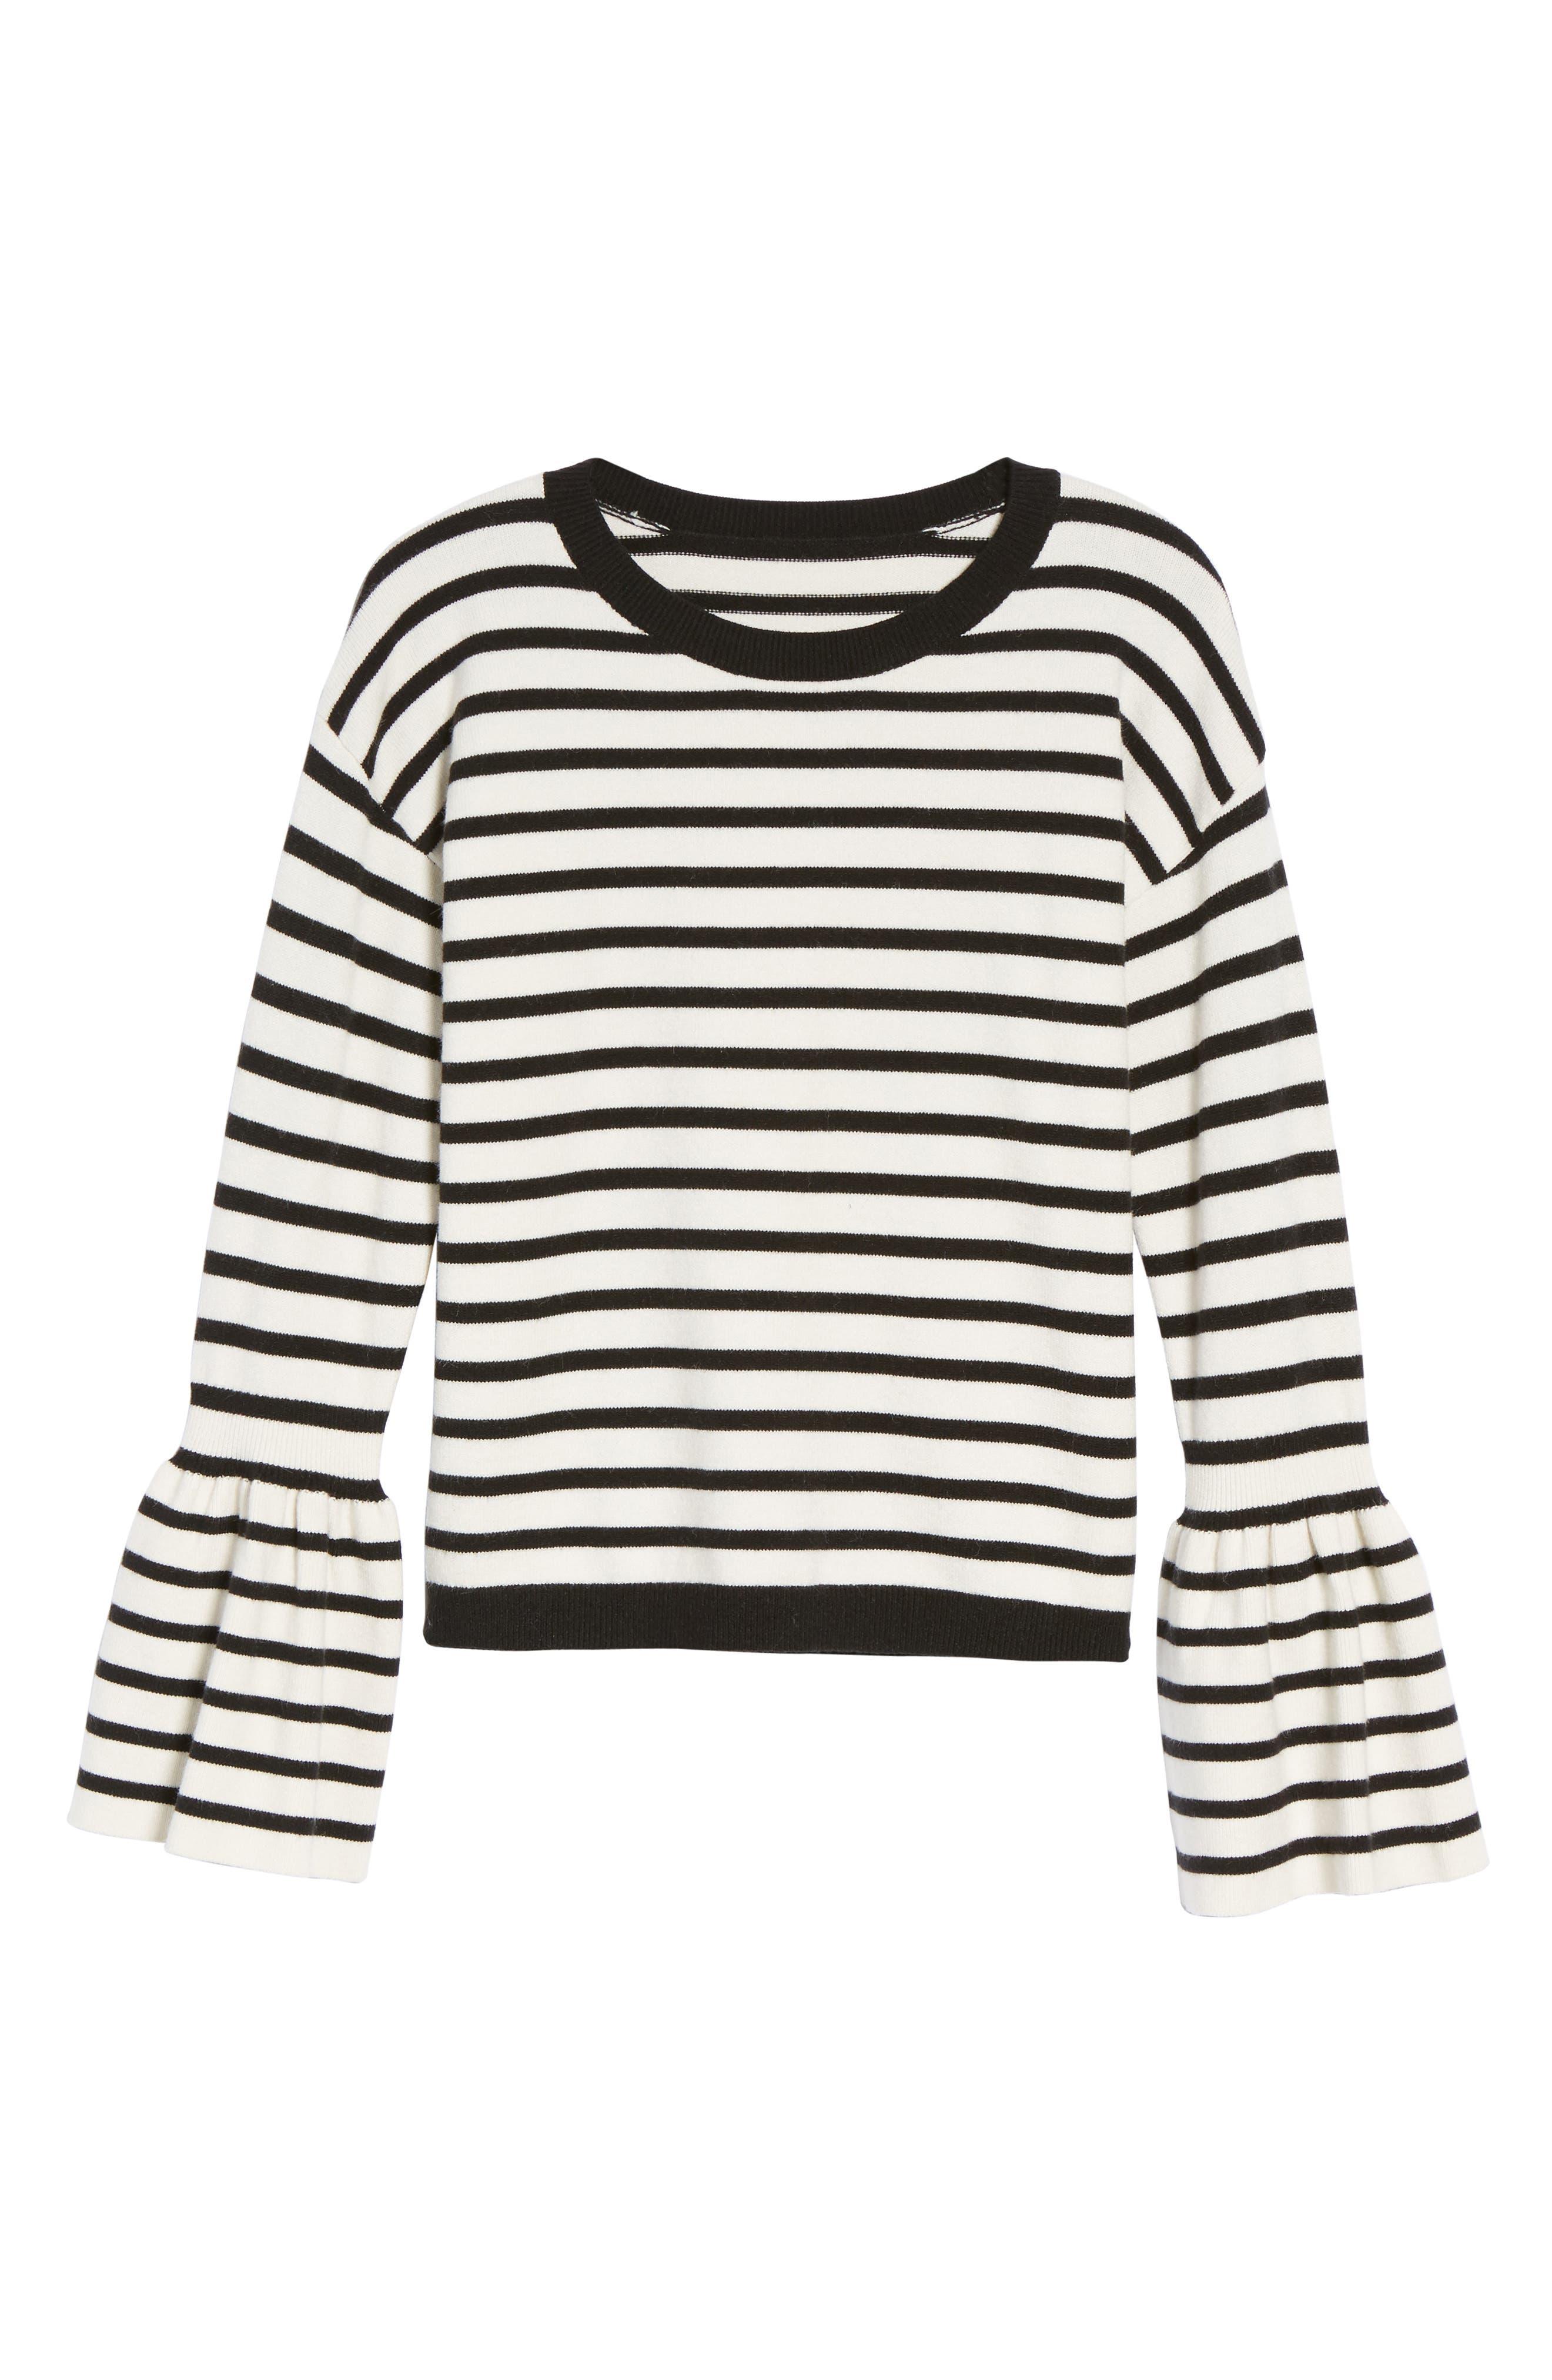 Bell Sleeve Sweater,                             Alternate thumbnail 6, color,                             Black- Ivory Stripe